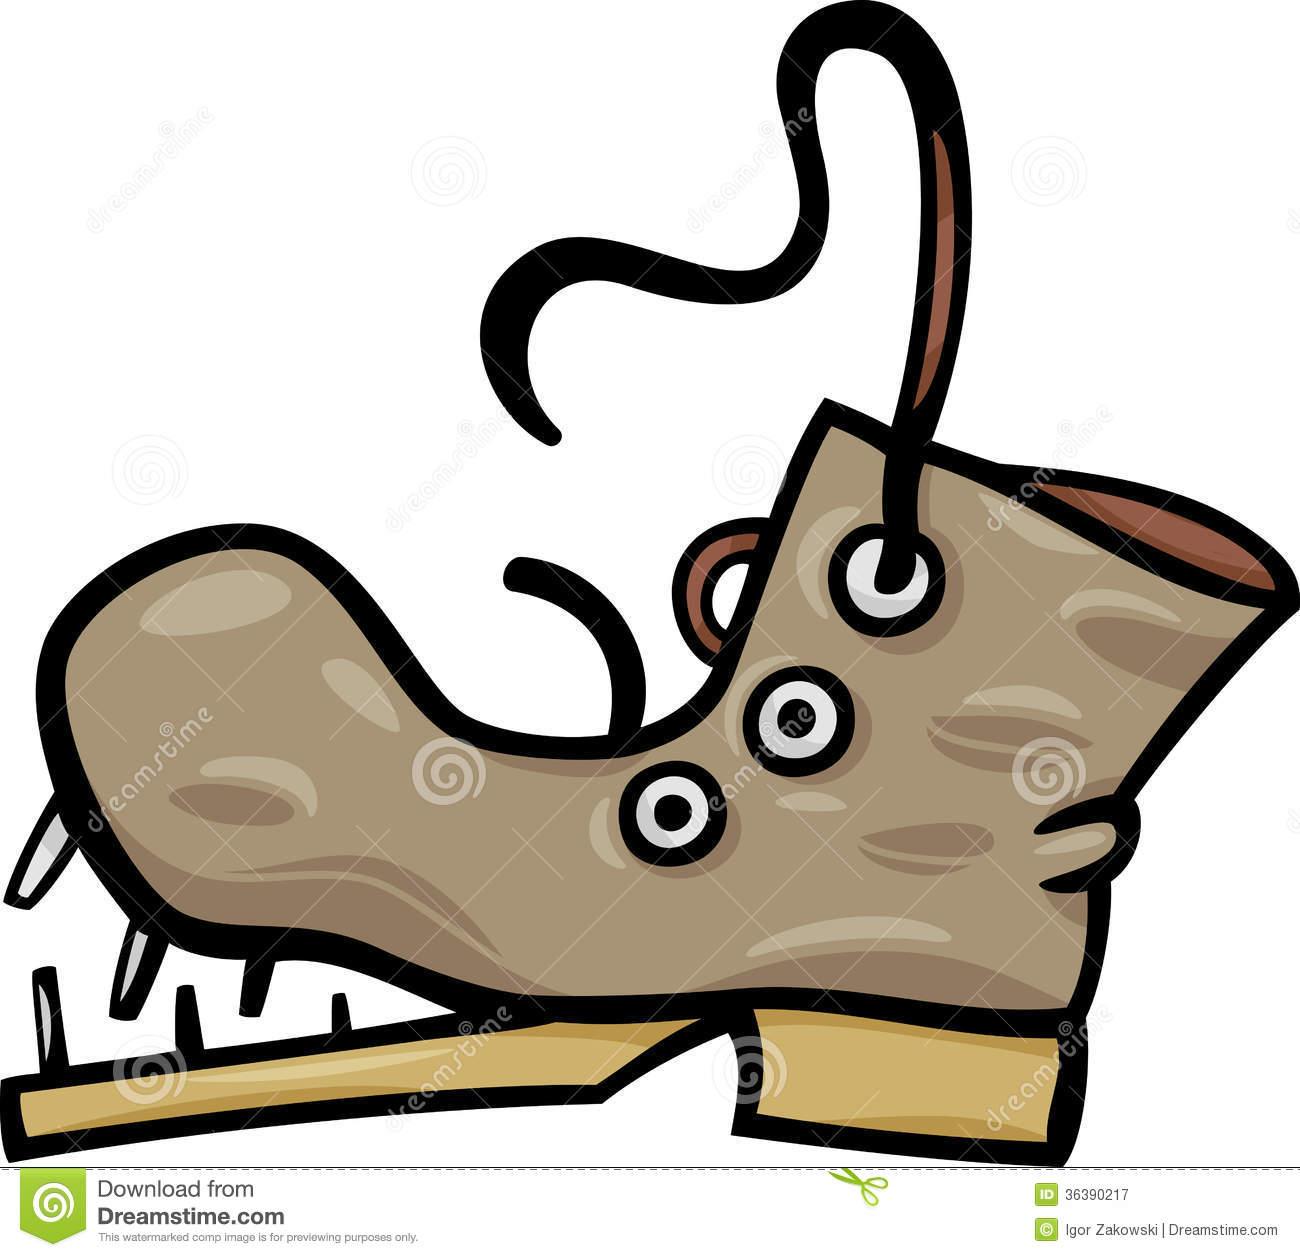 Shoestring clipart svg free download Shoestring Clipart | Clipart Panda - Free Clipart Images svg free download